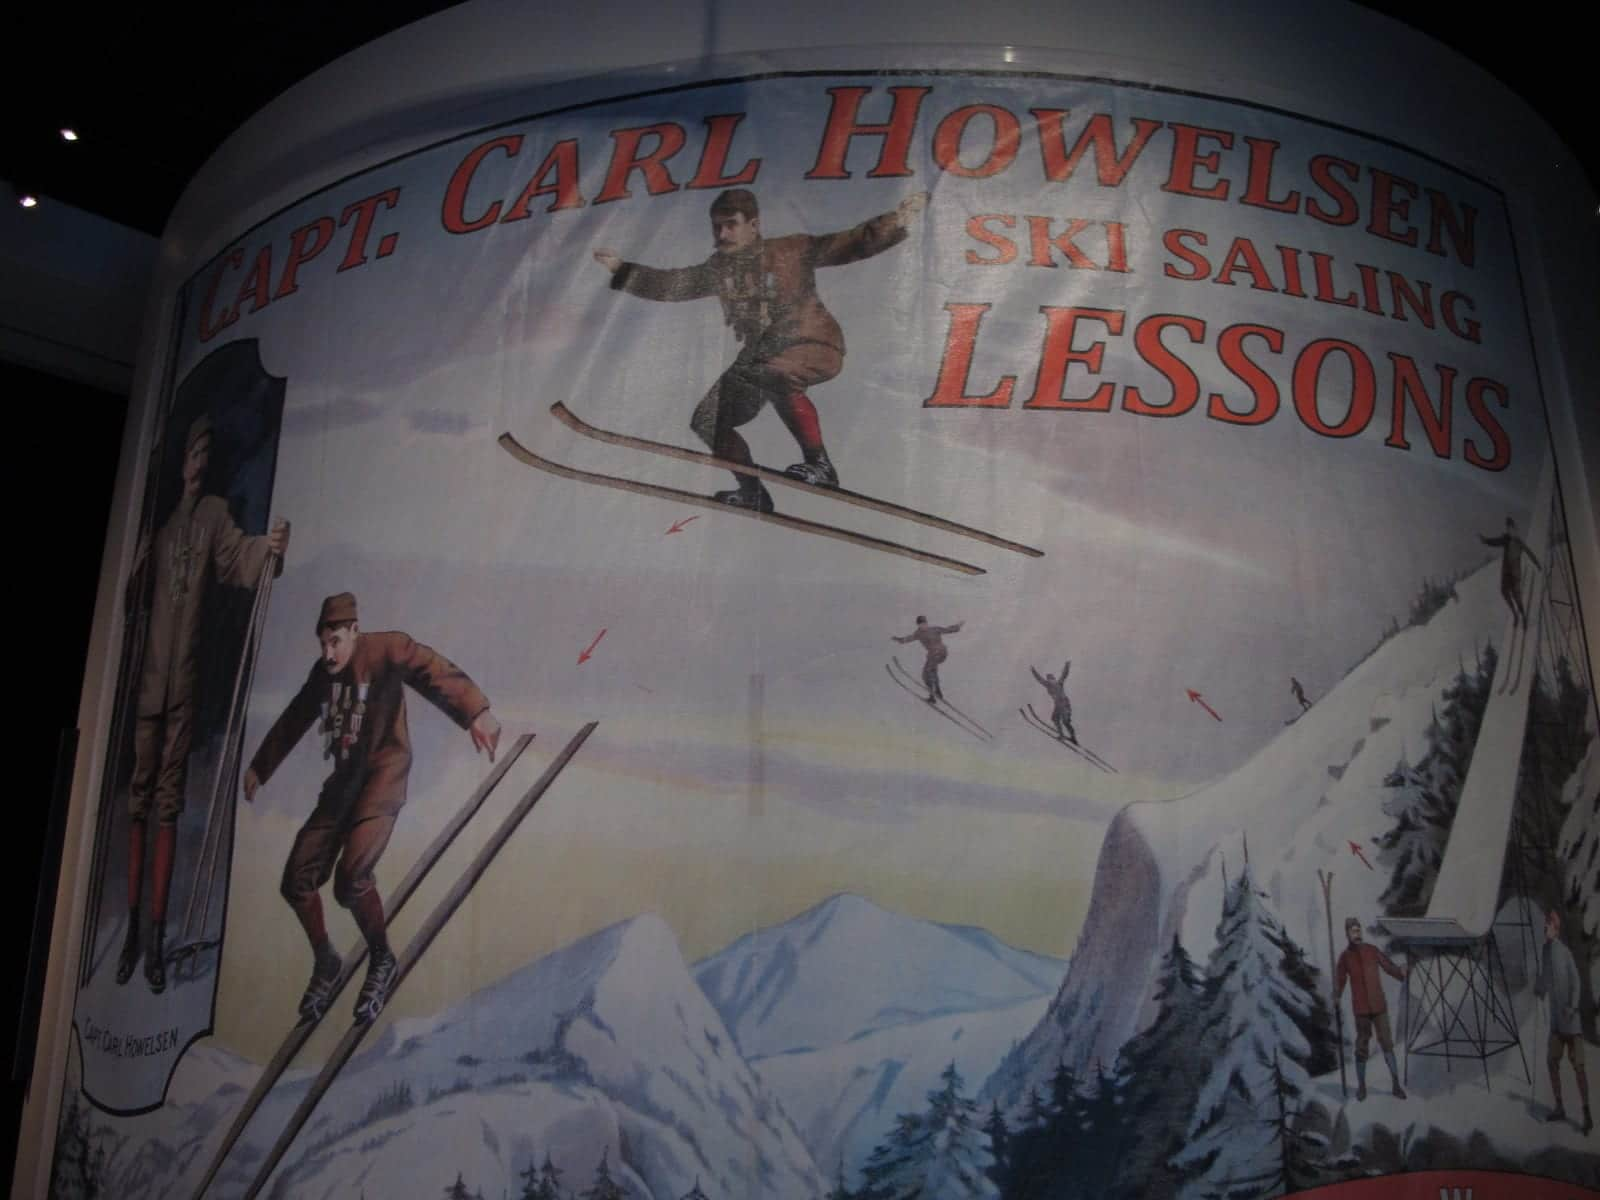 Capt. Carl Howelsen Ski Sailing Lessons, History Colorado Center